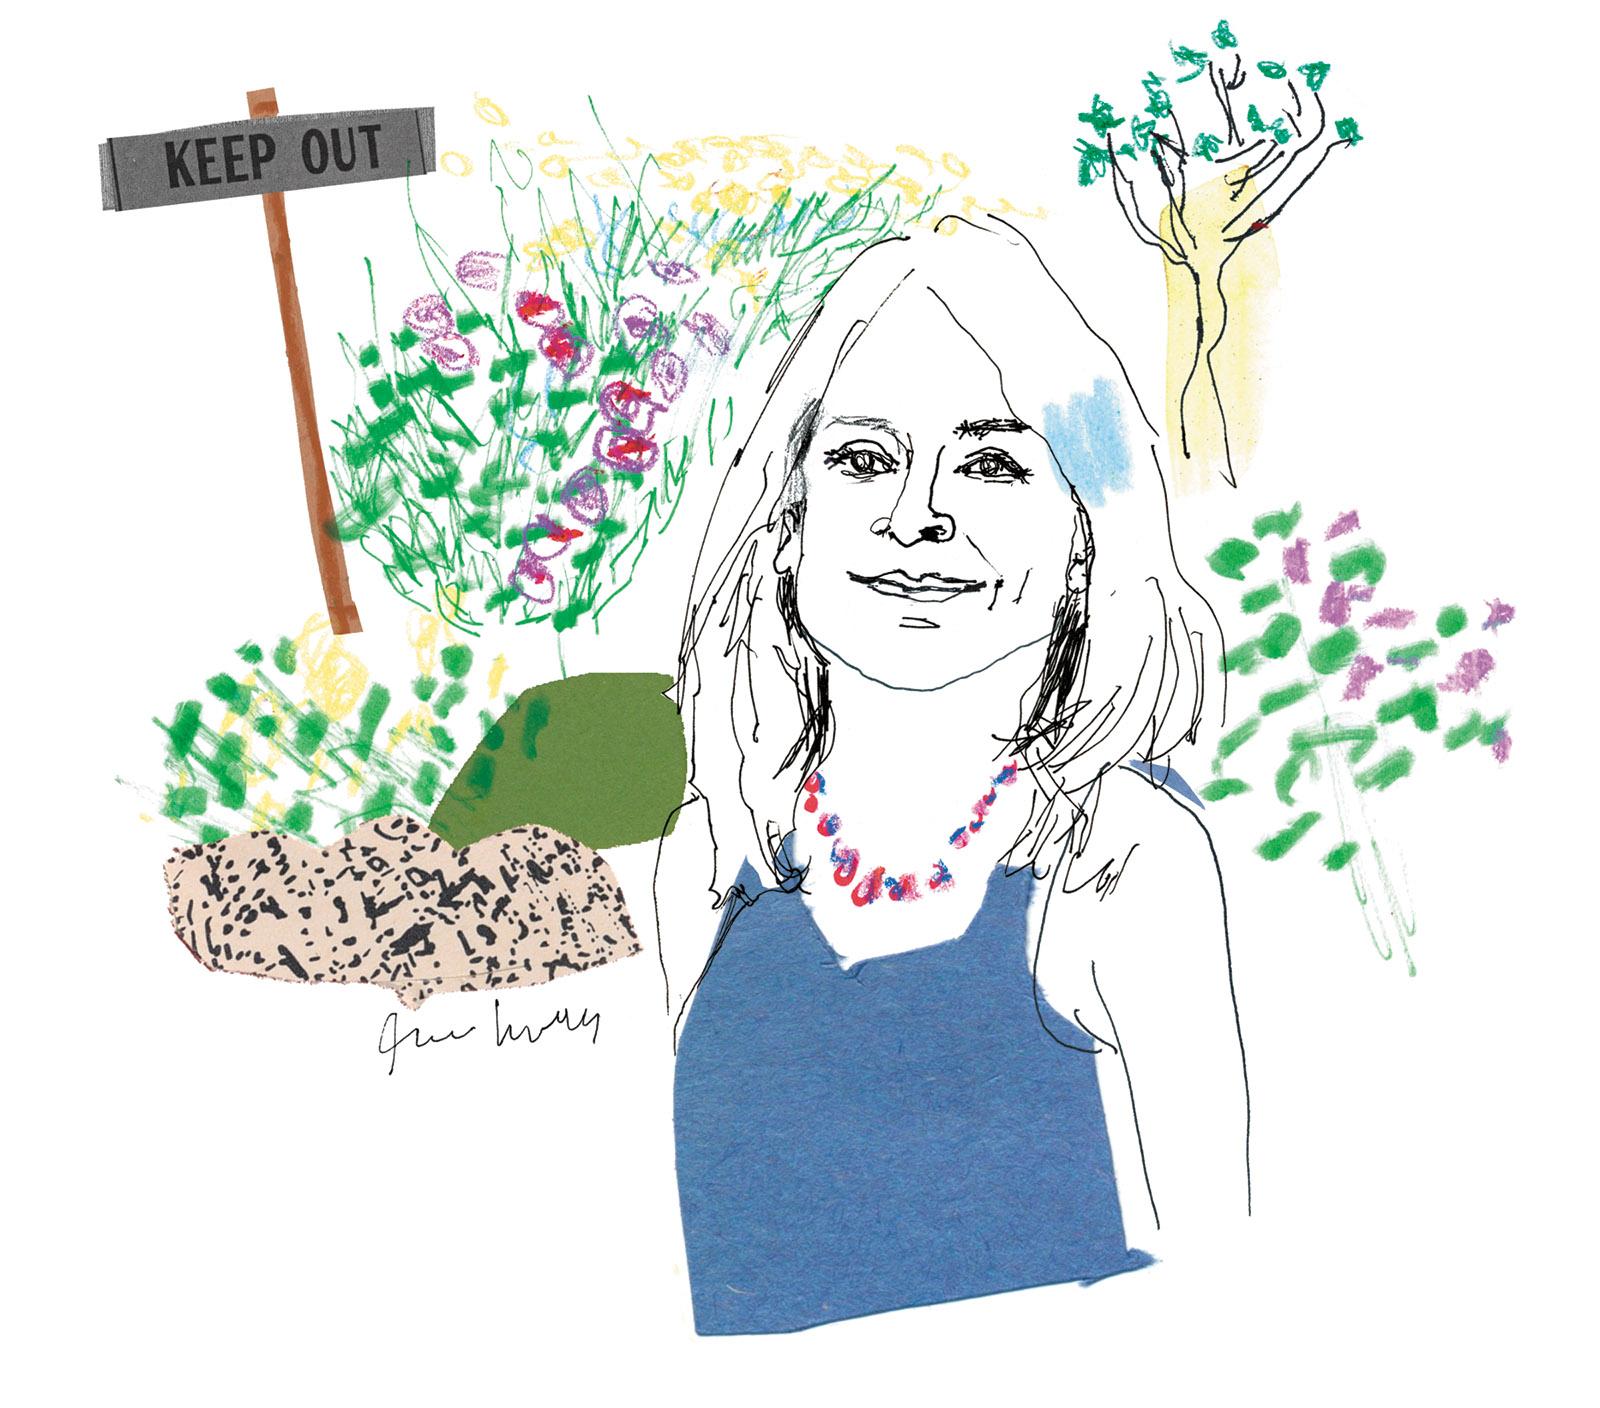 Karen Russell; illustration by Joanna Neborsky